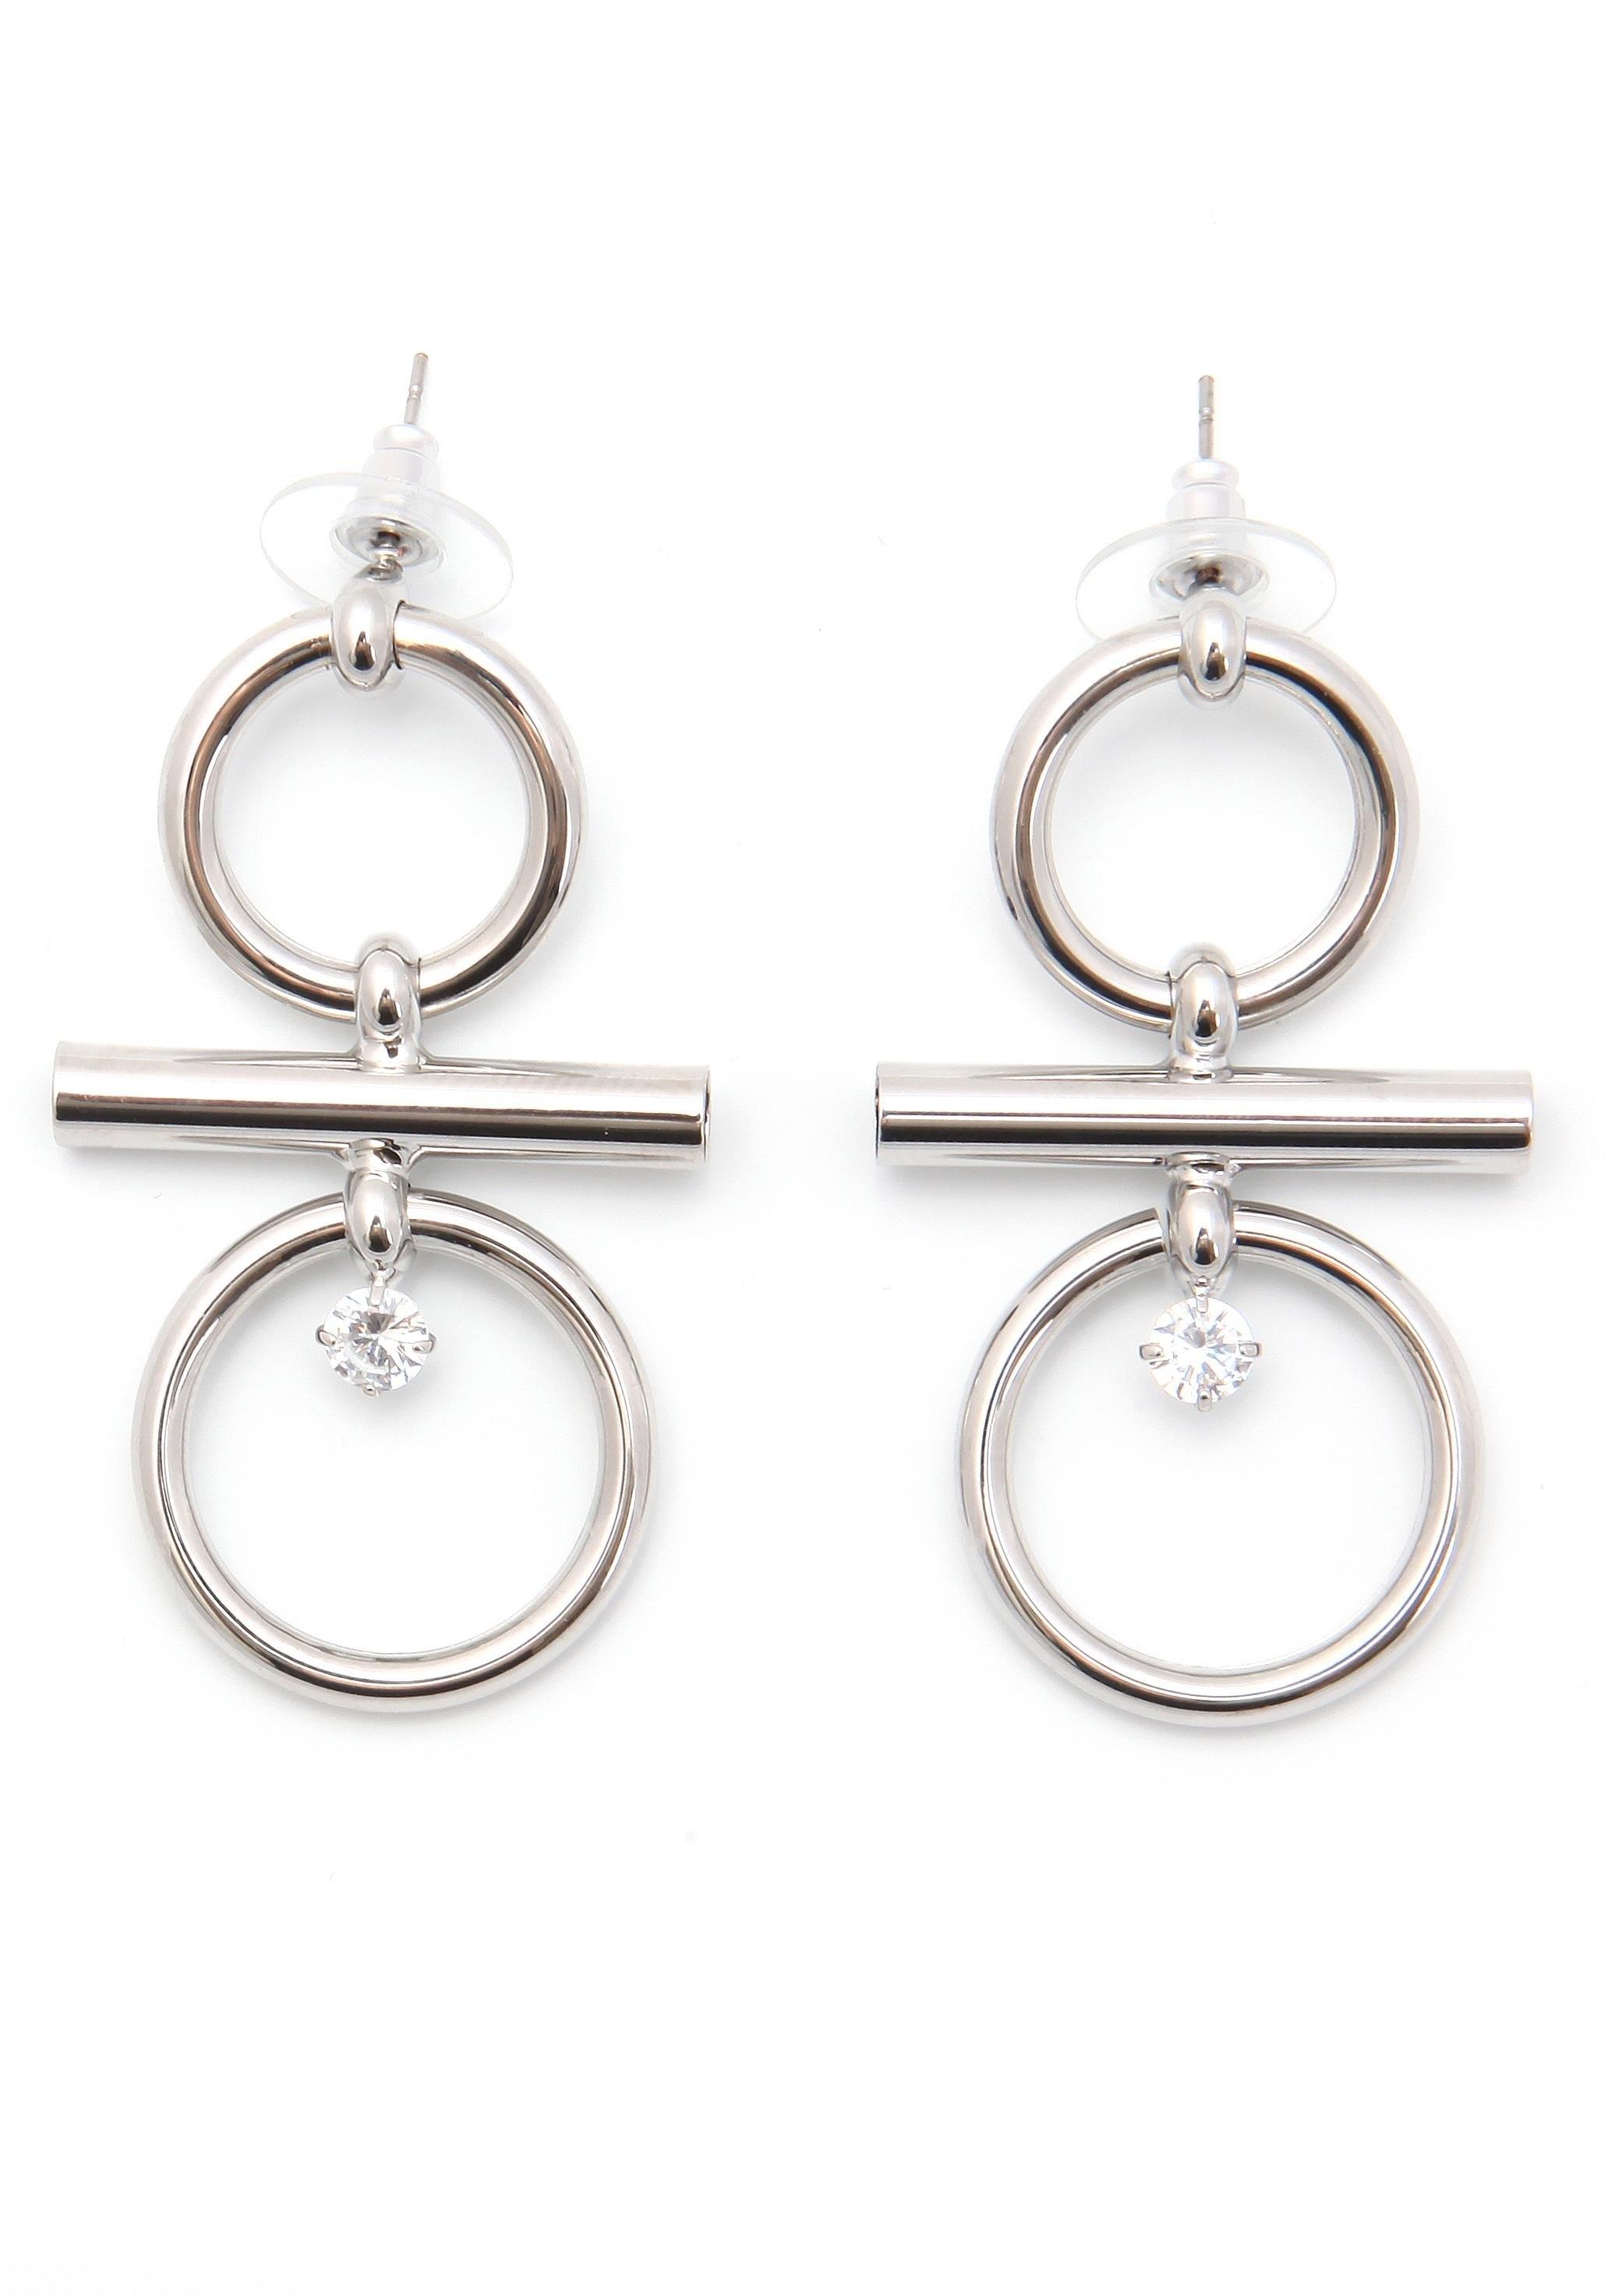 J JAYZ oorstekers »Kreis-Design, rhodiniert« nu online bestellen